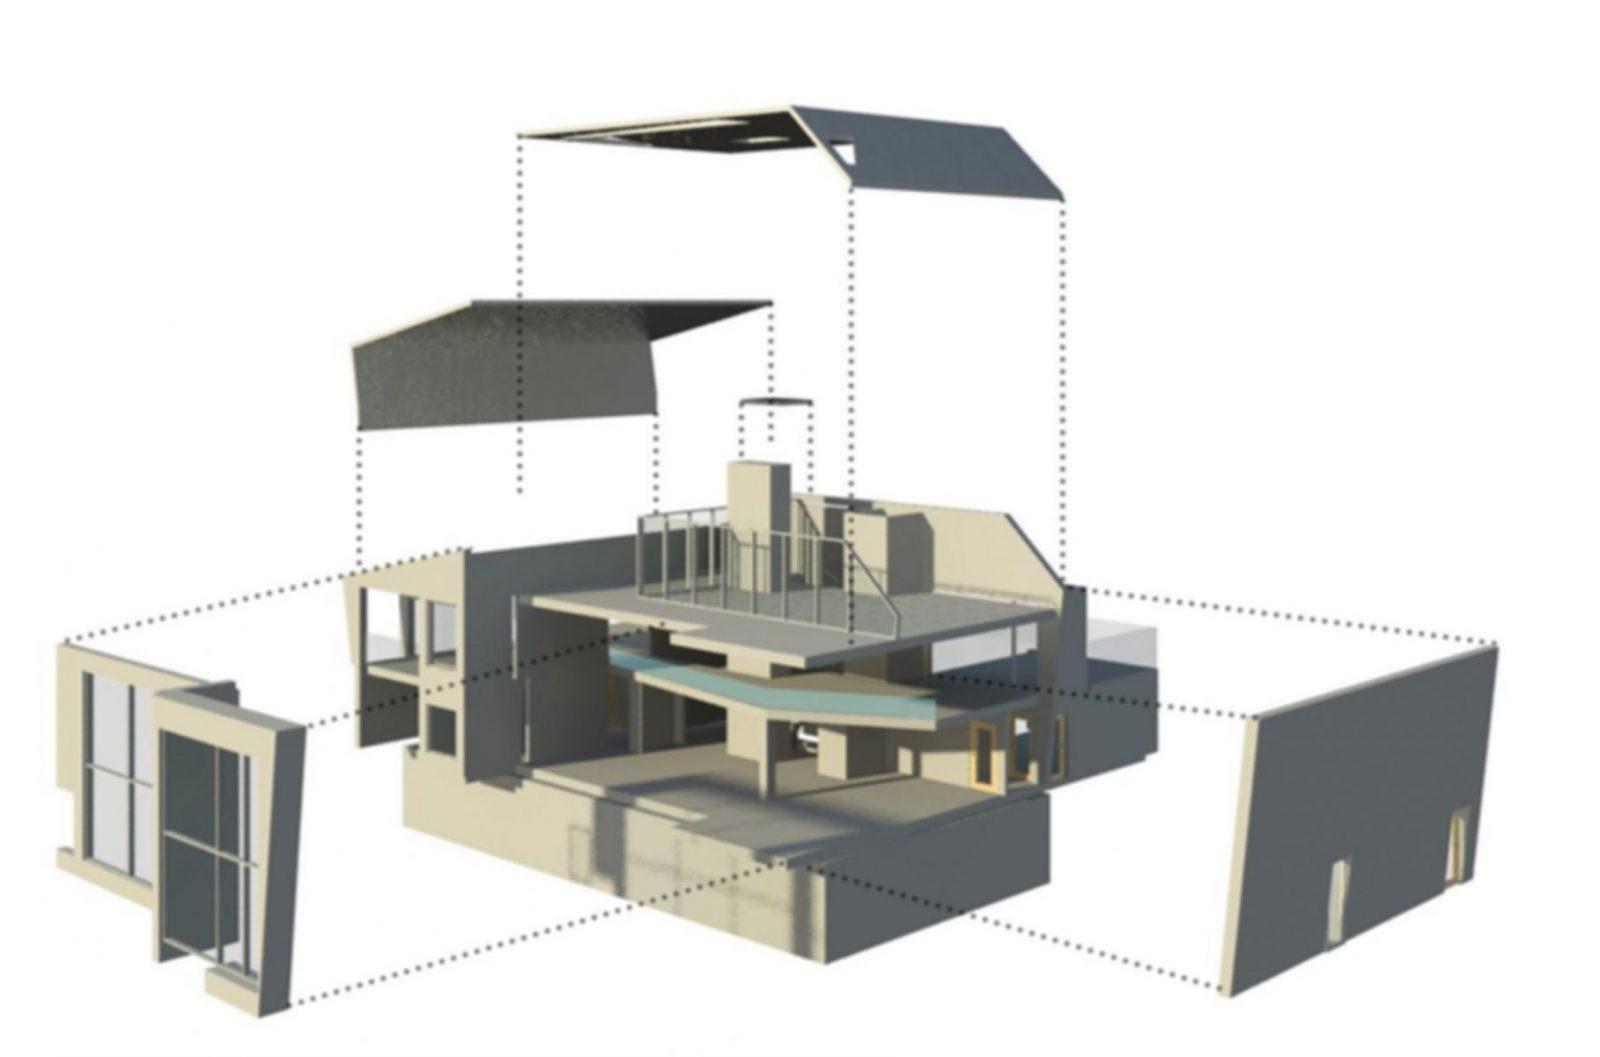 weathervane house modern architecture saundersfoot pembrokeshire architects jersey1